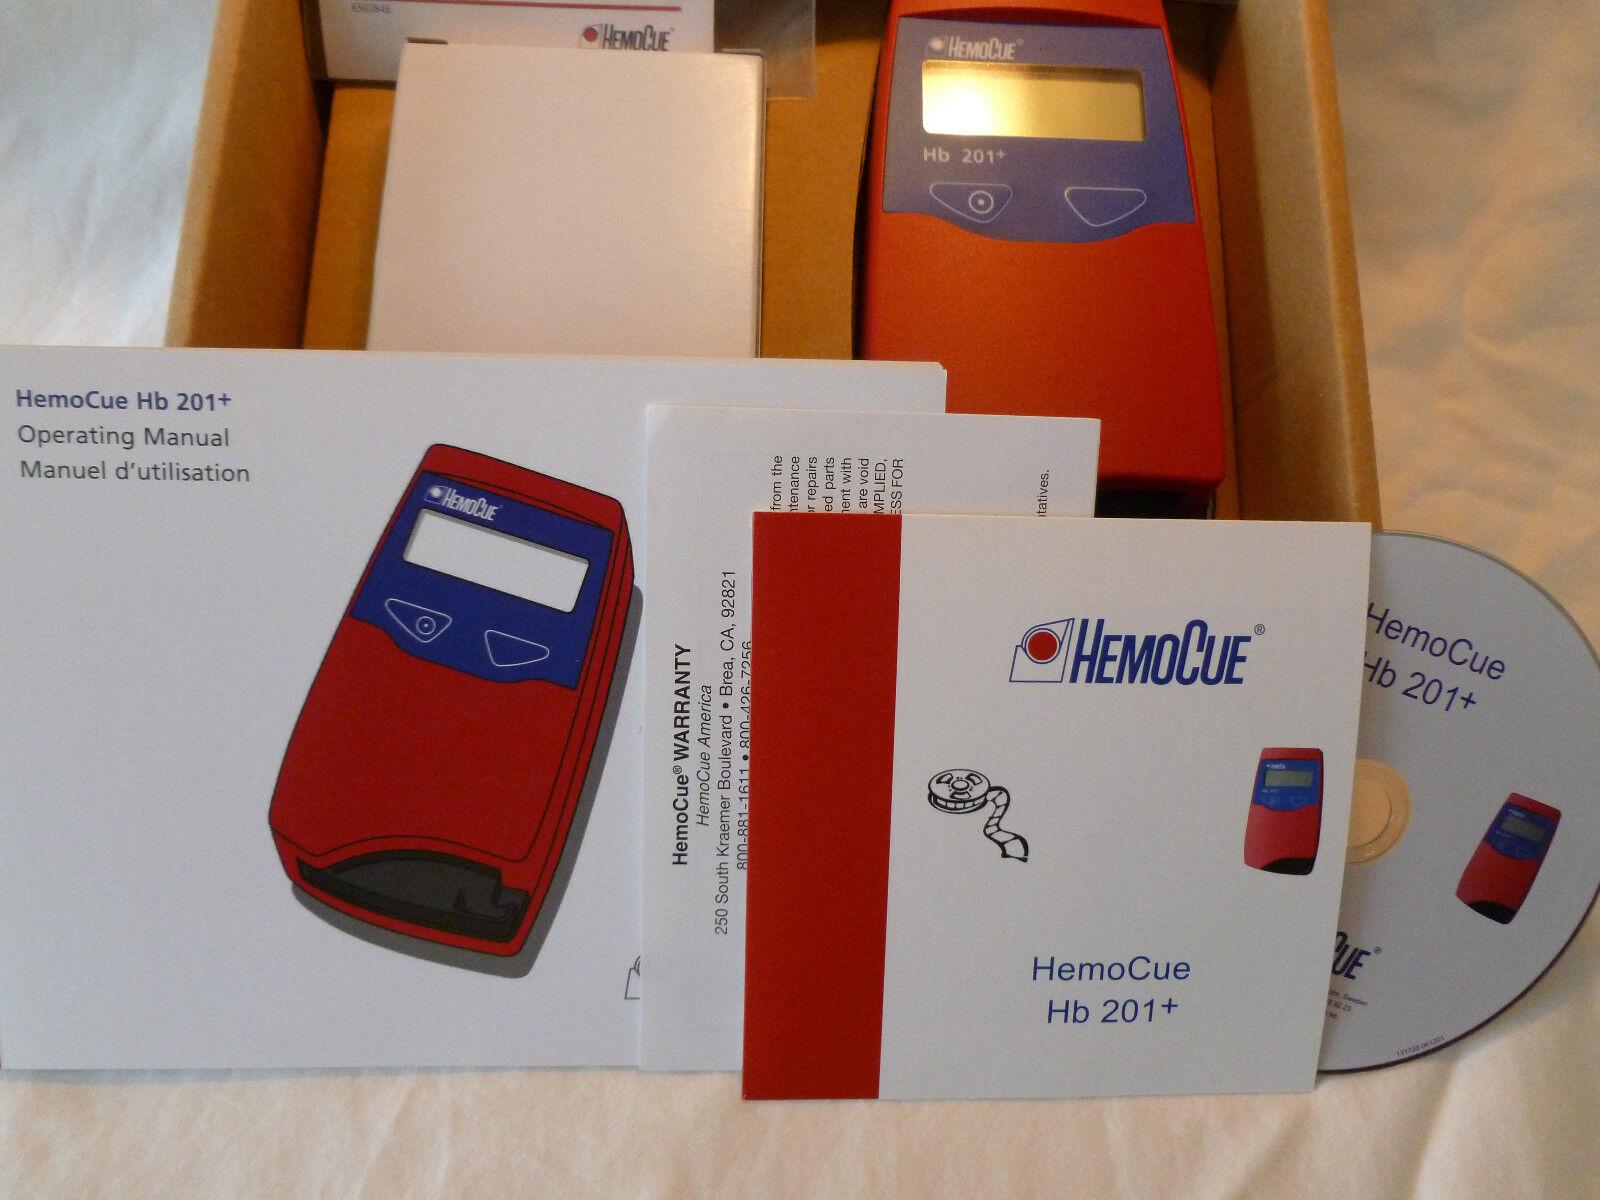 BRAND NEW IN BOX HB 201+ HEMOCUE ANALYZER 121721 HEMOGLOBIN METER LAB SYSTEM KIT